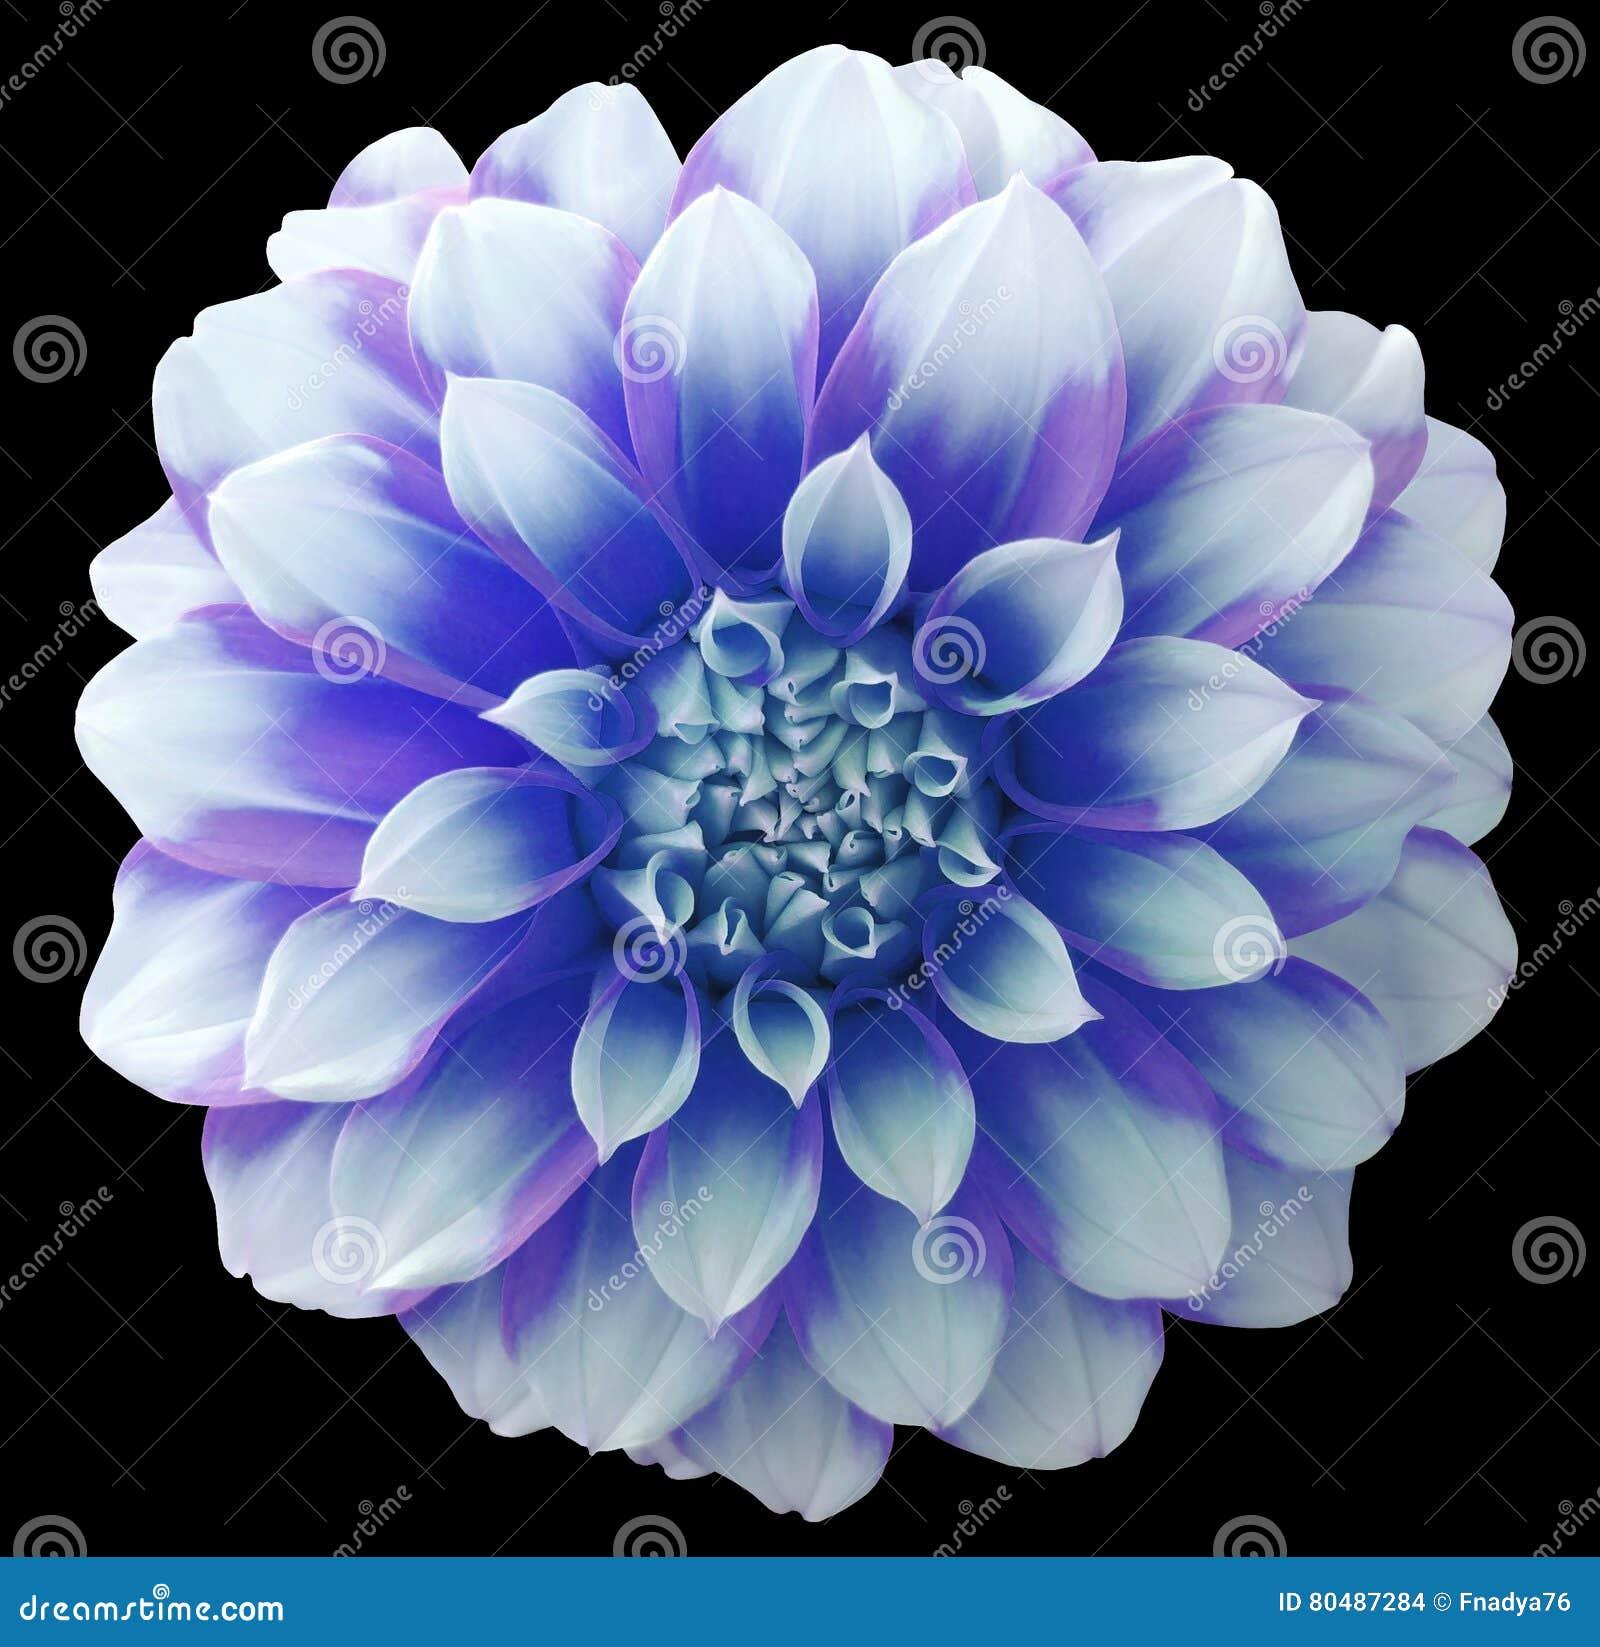 Dahlia blue white flower variegated flower black background download comp izmirmasajfo